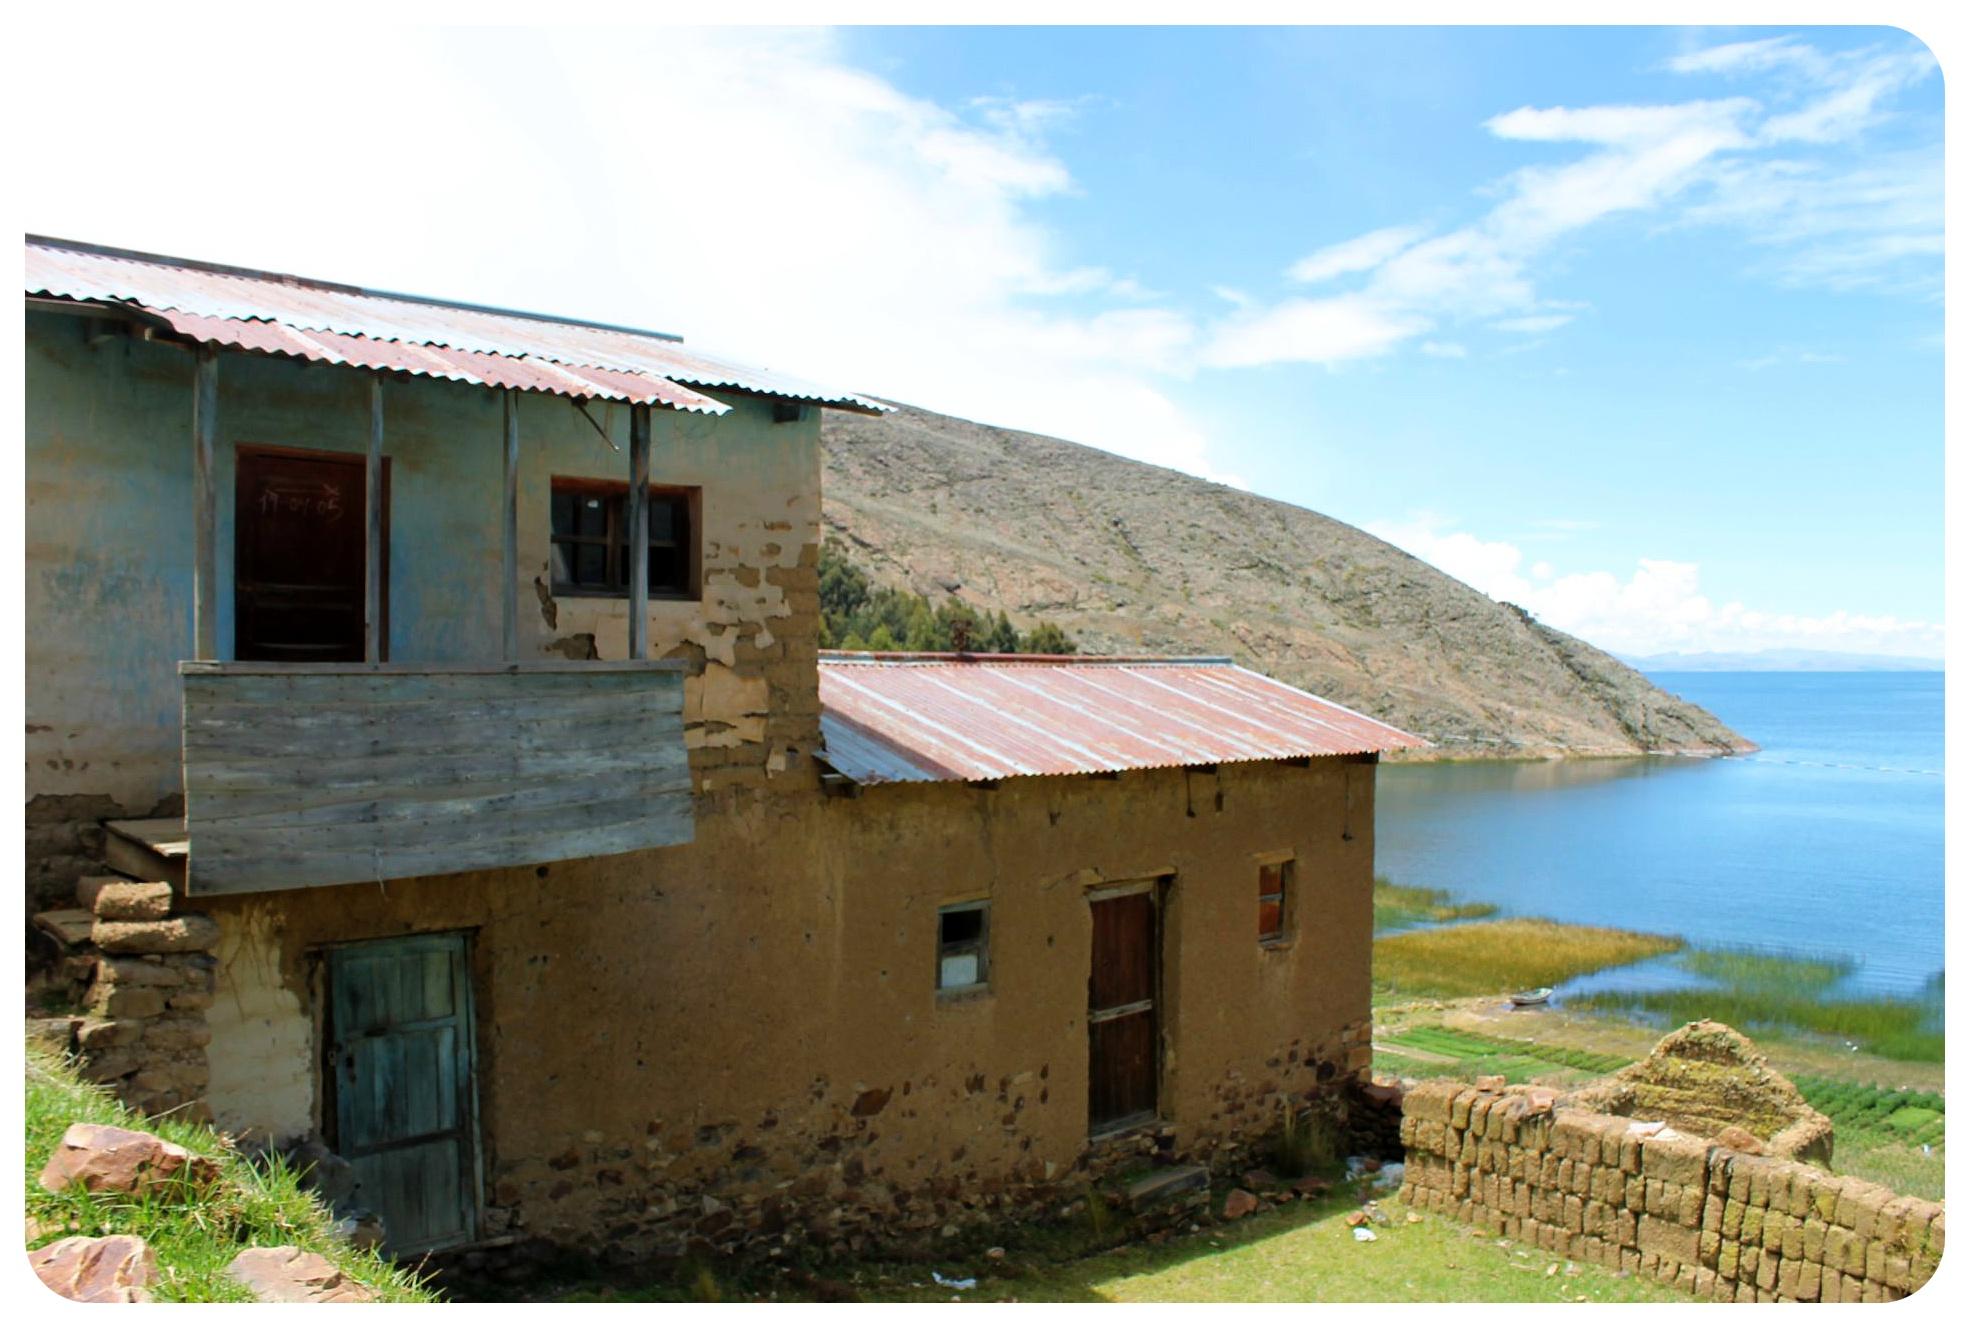 lake titicaca houses